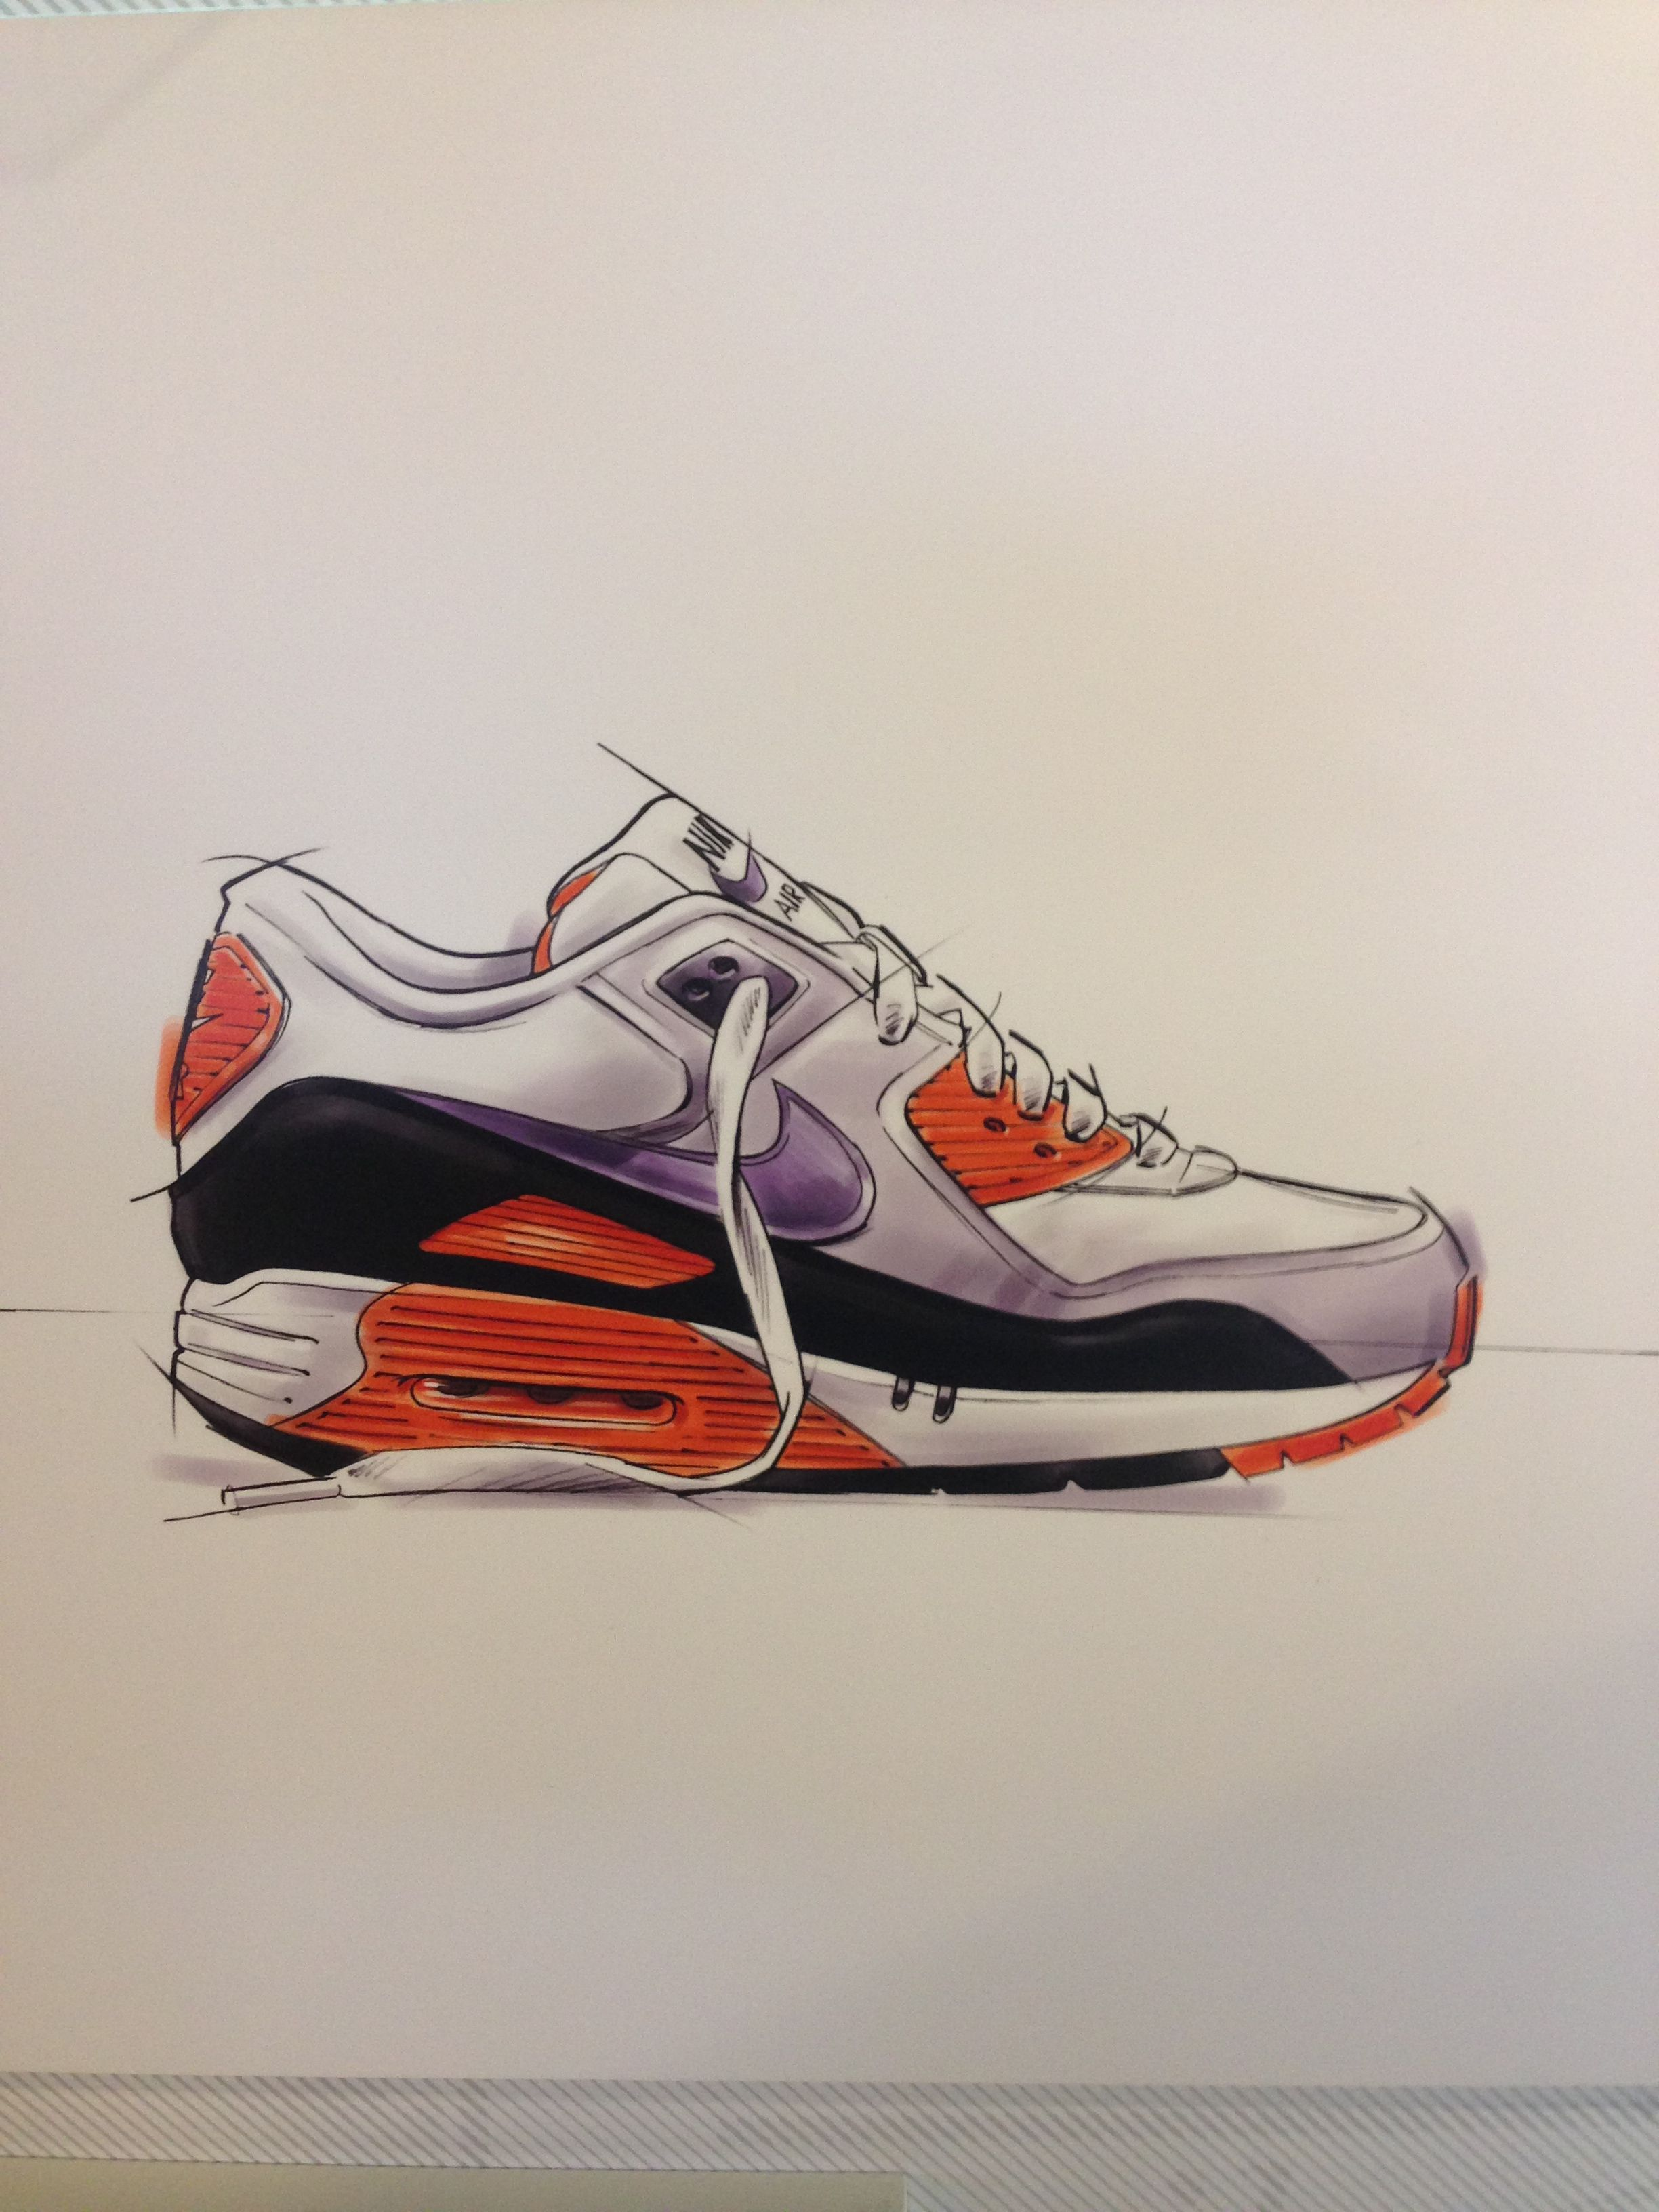 5ce96860f179 Air Max 90 drawing